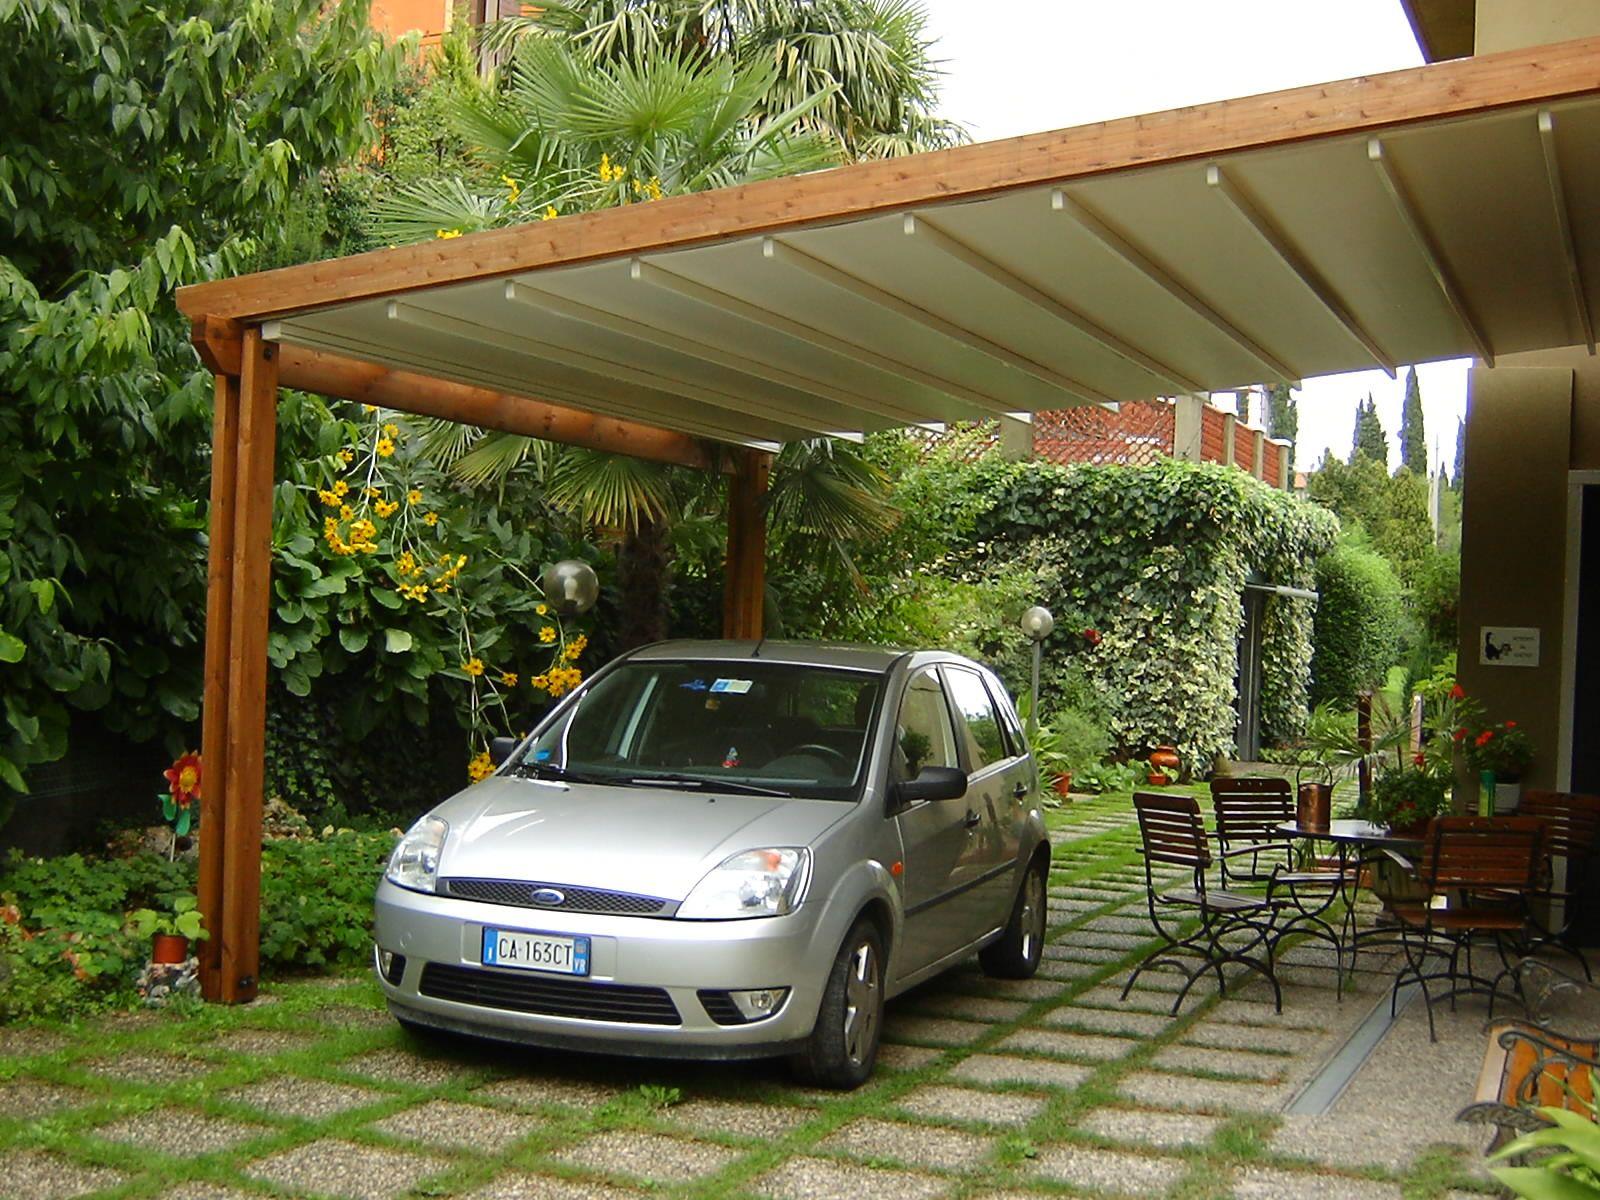 Tettoia e pergola assieme tettoia per auto pinterest for La pergola prezzi